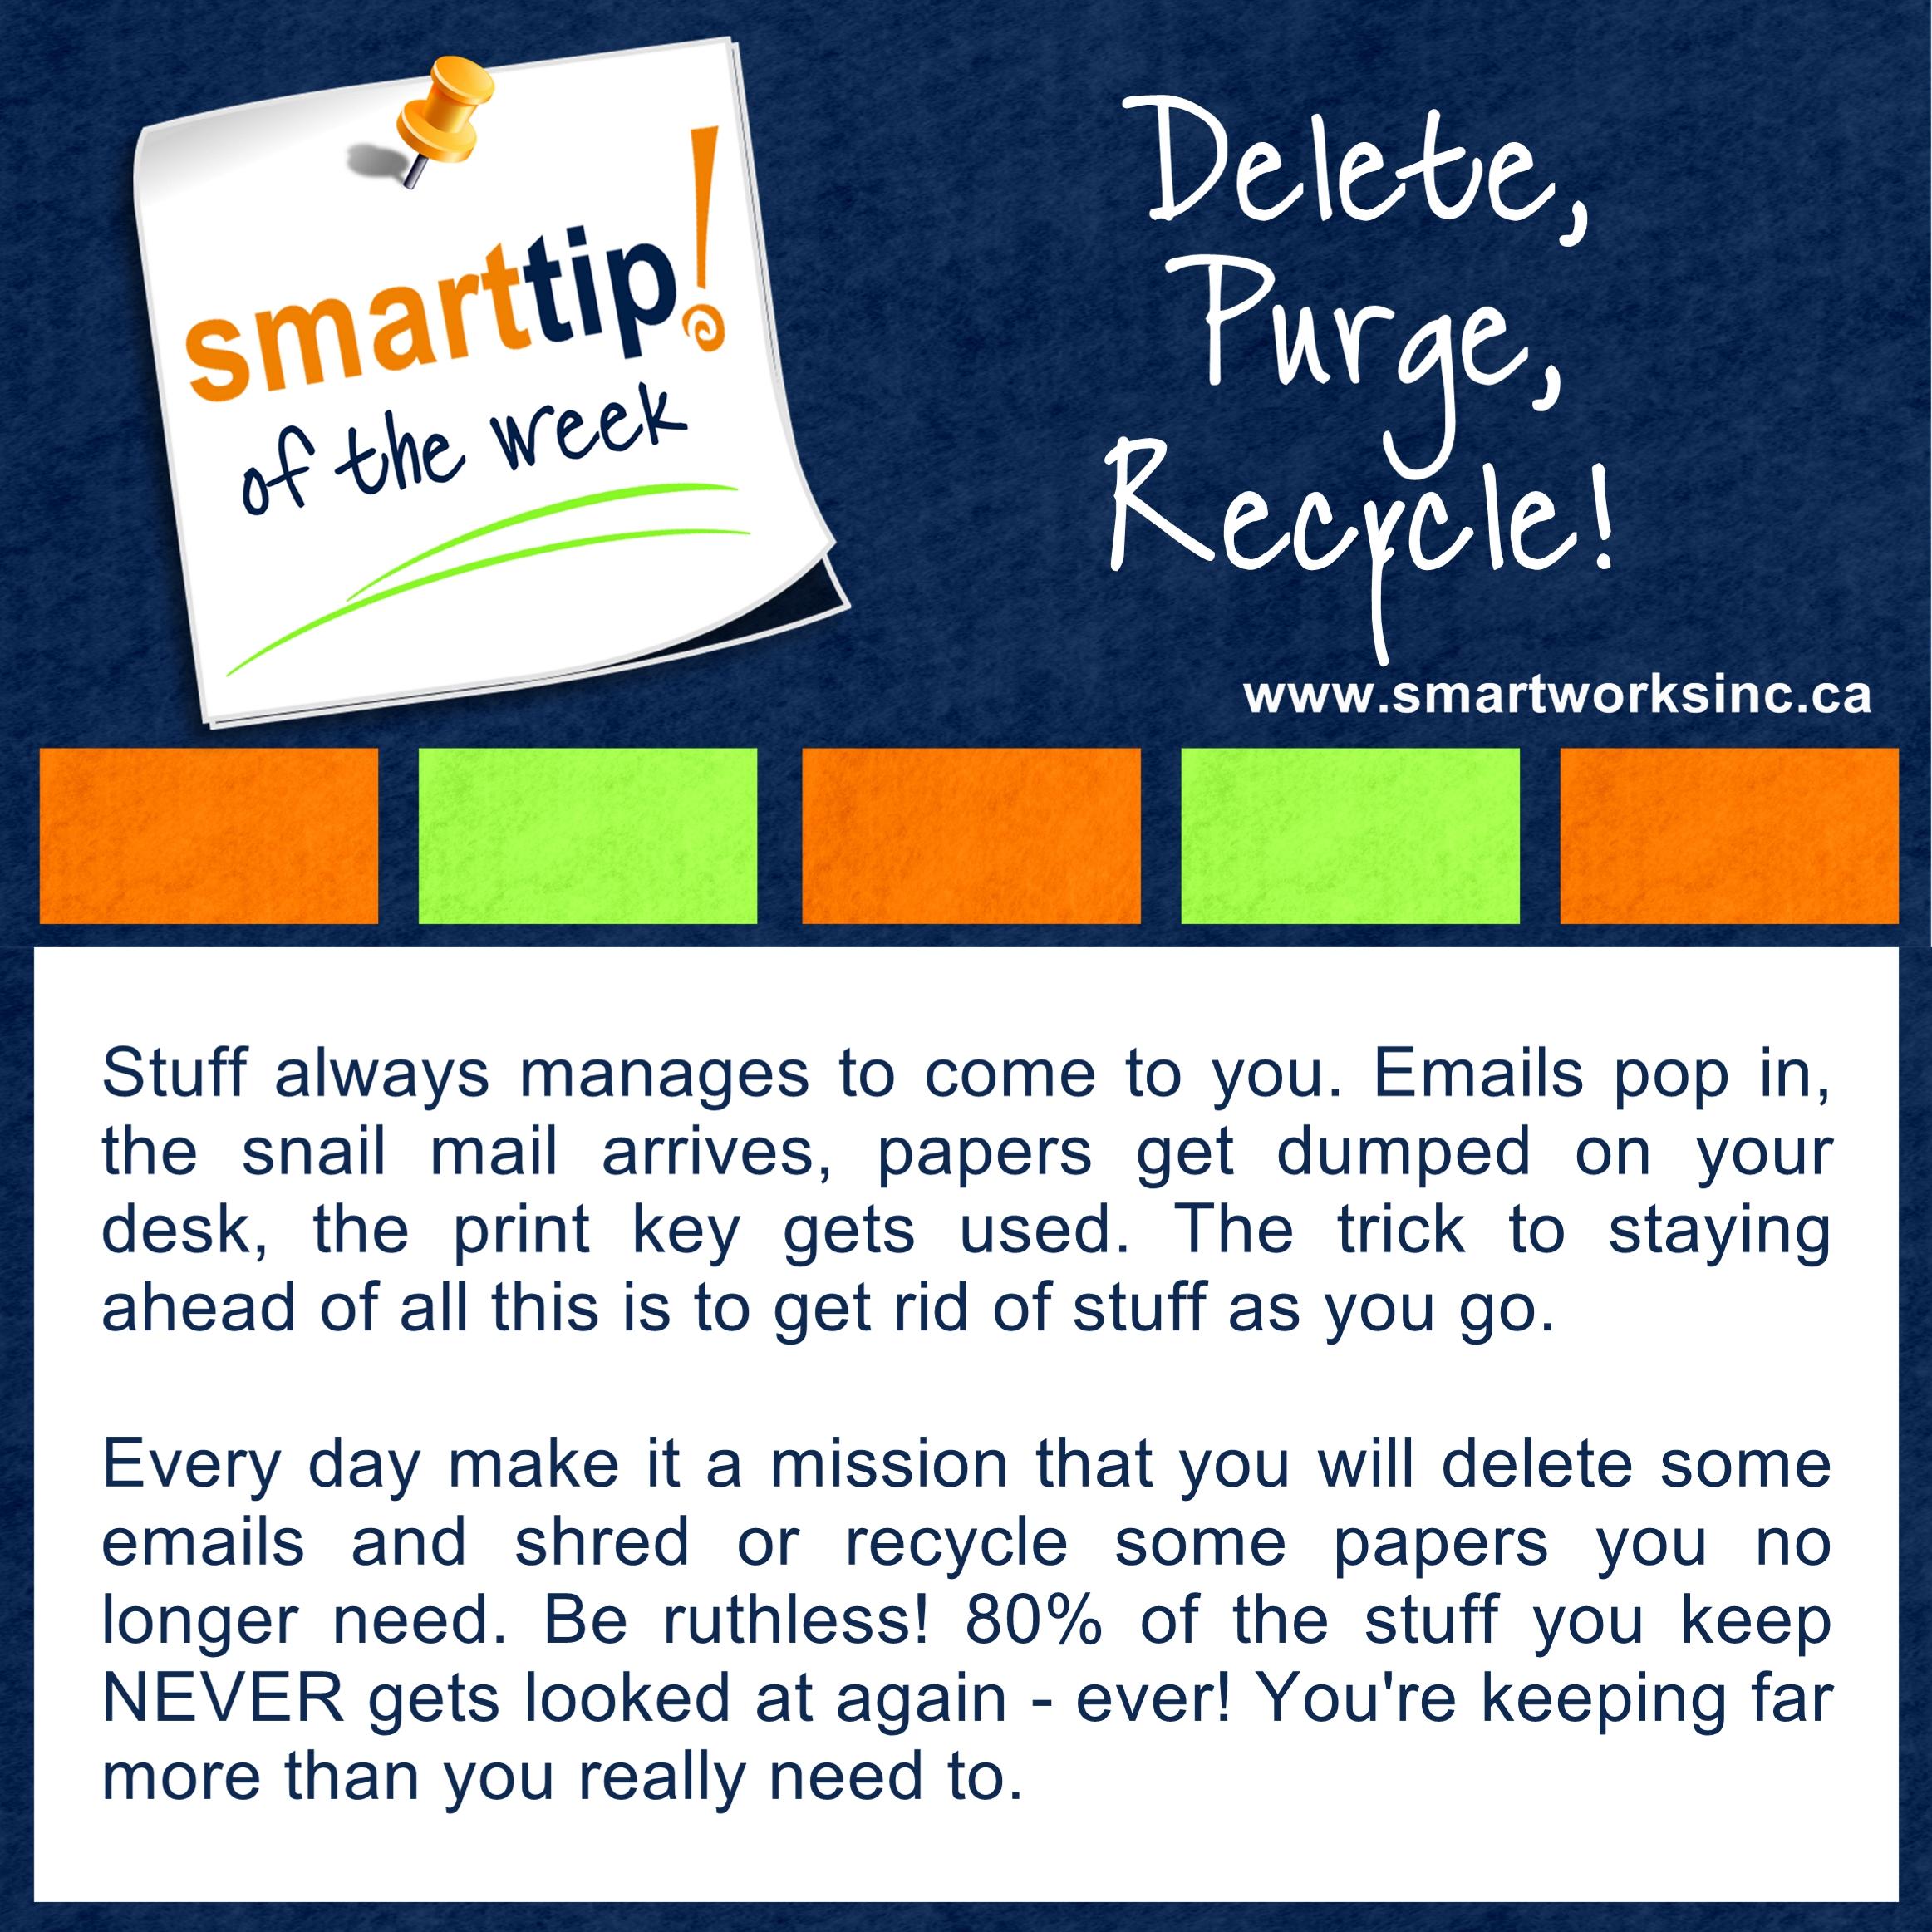 07 Delete Purge Recycle